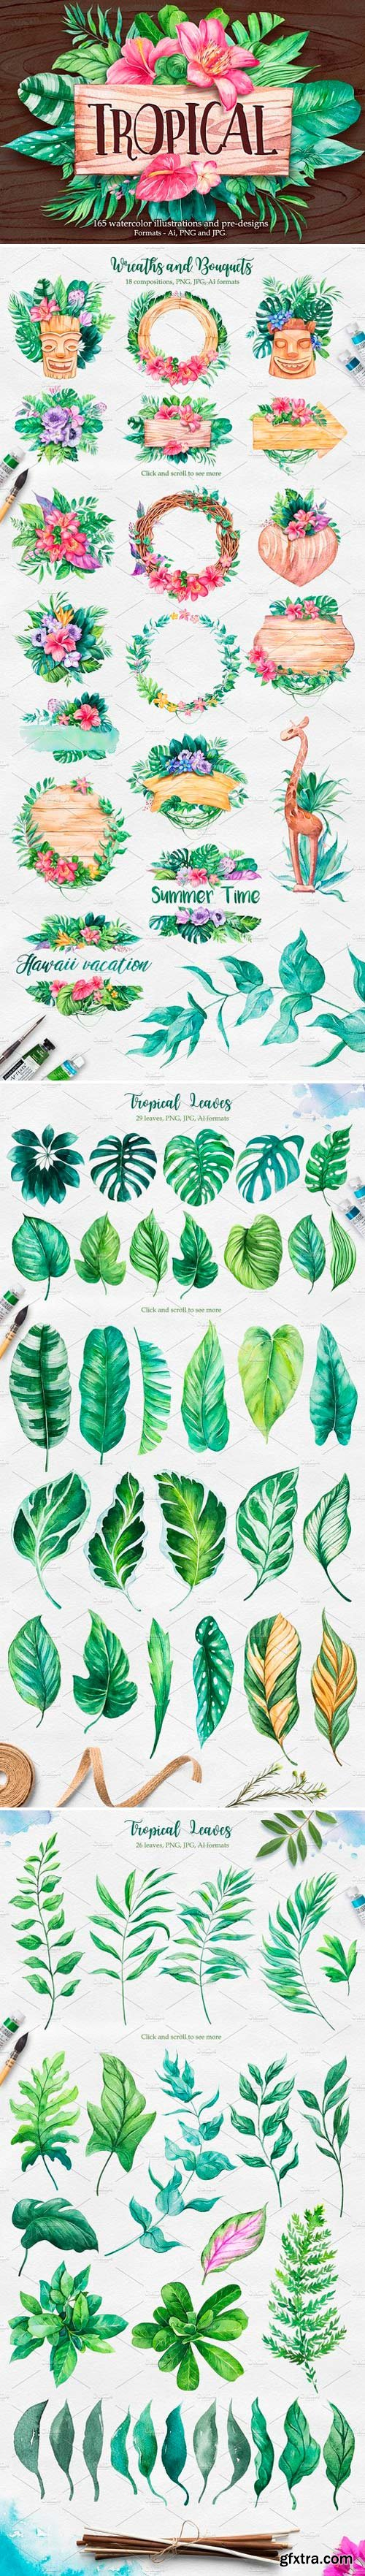 CM - Tropical Watercolor illustrations 2379405